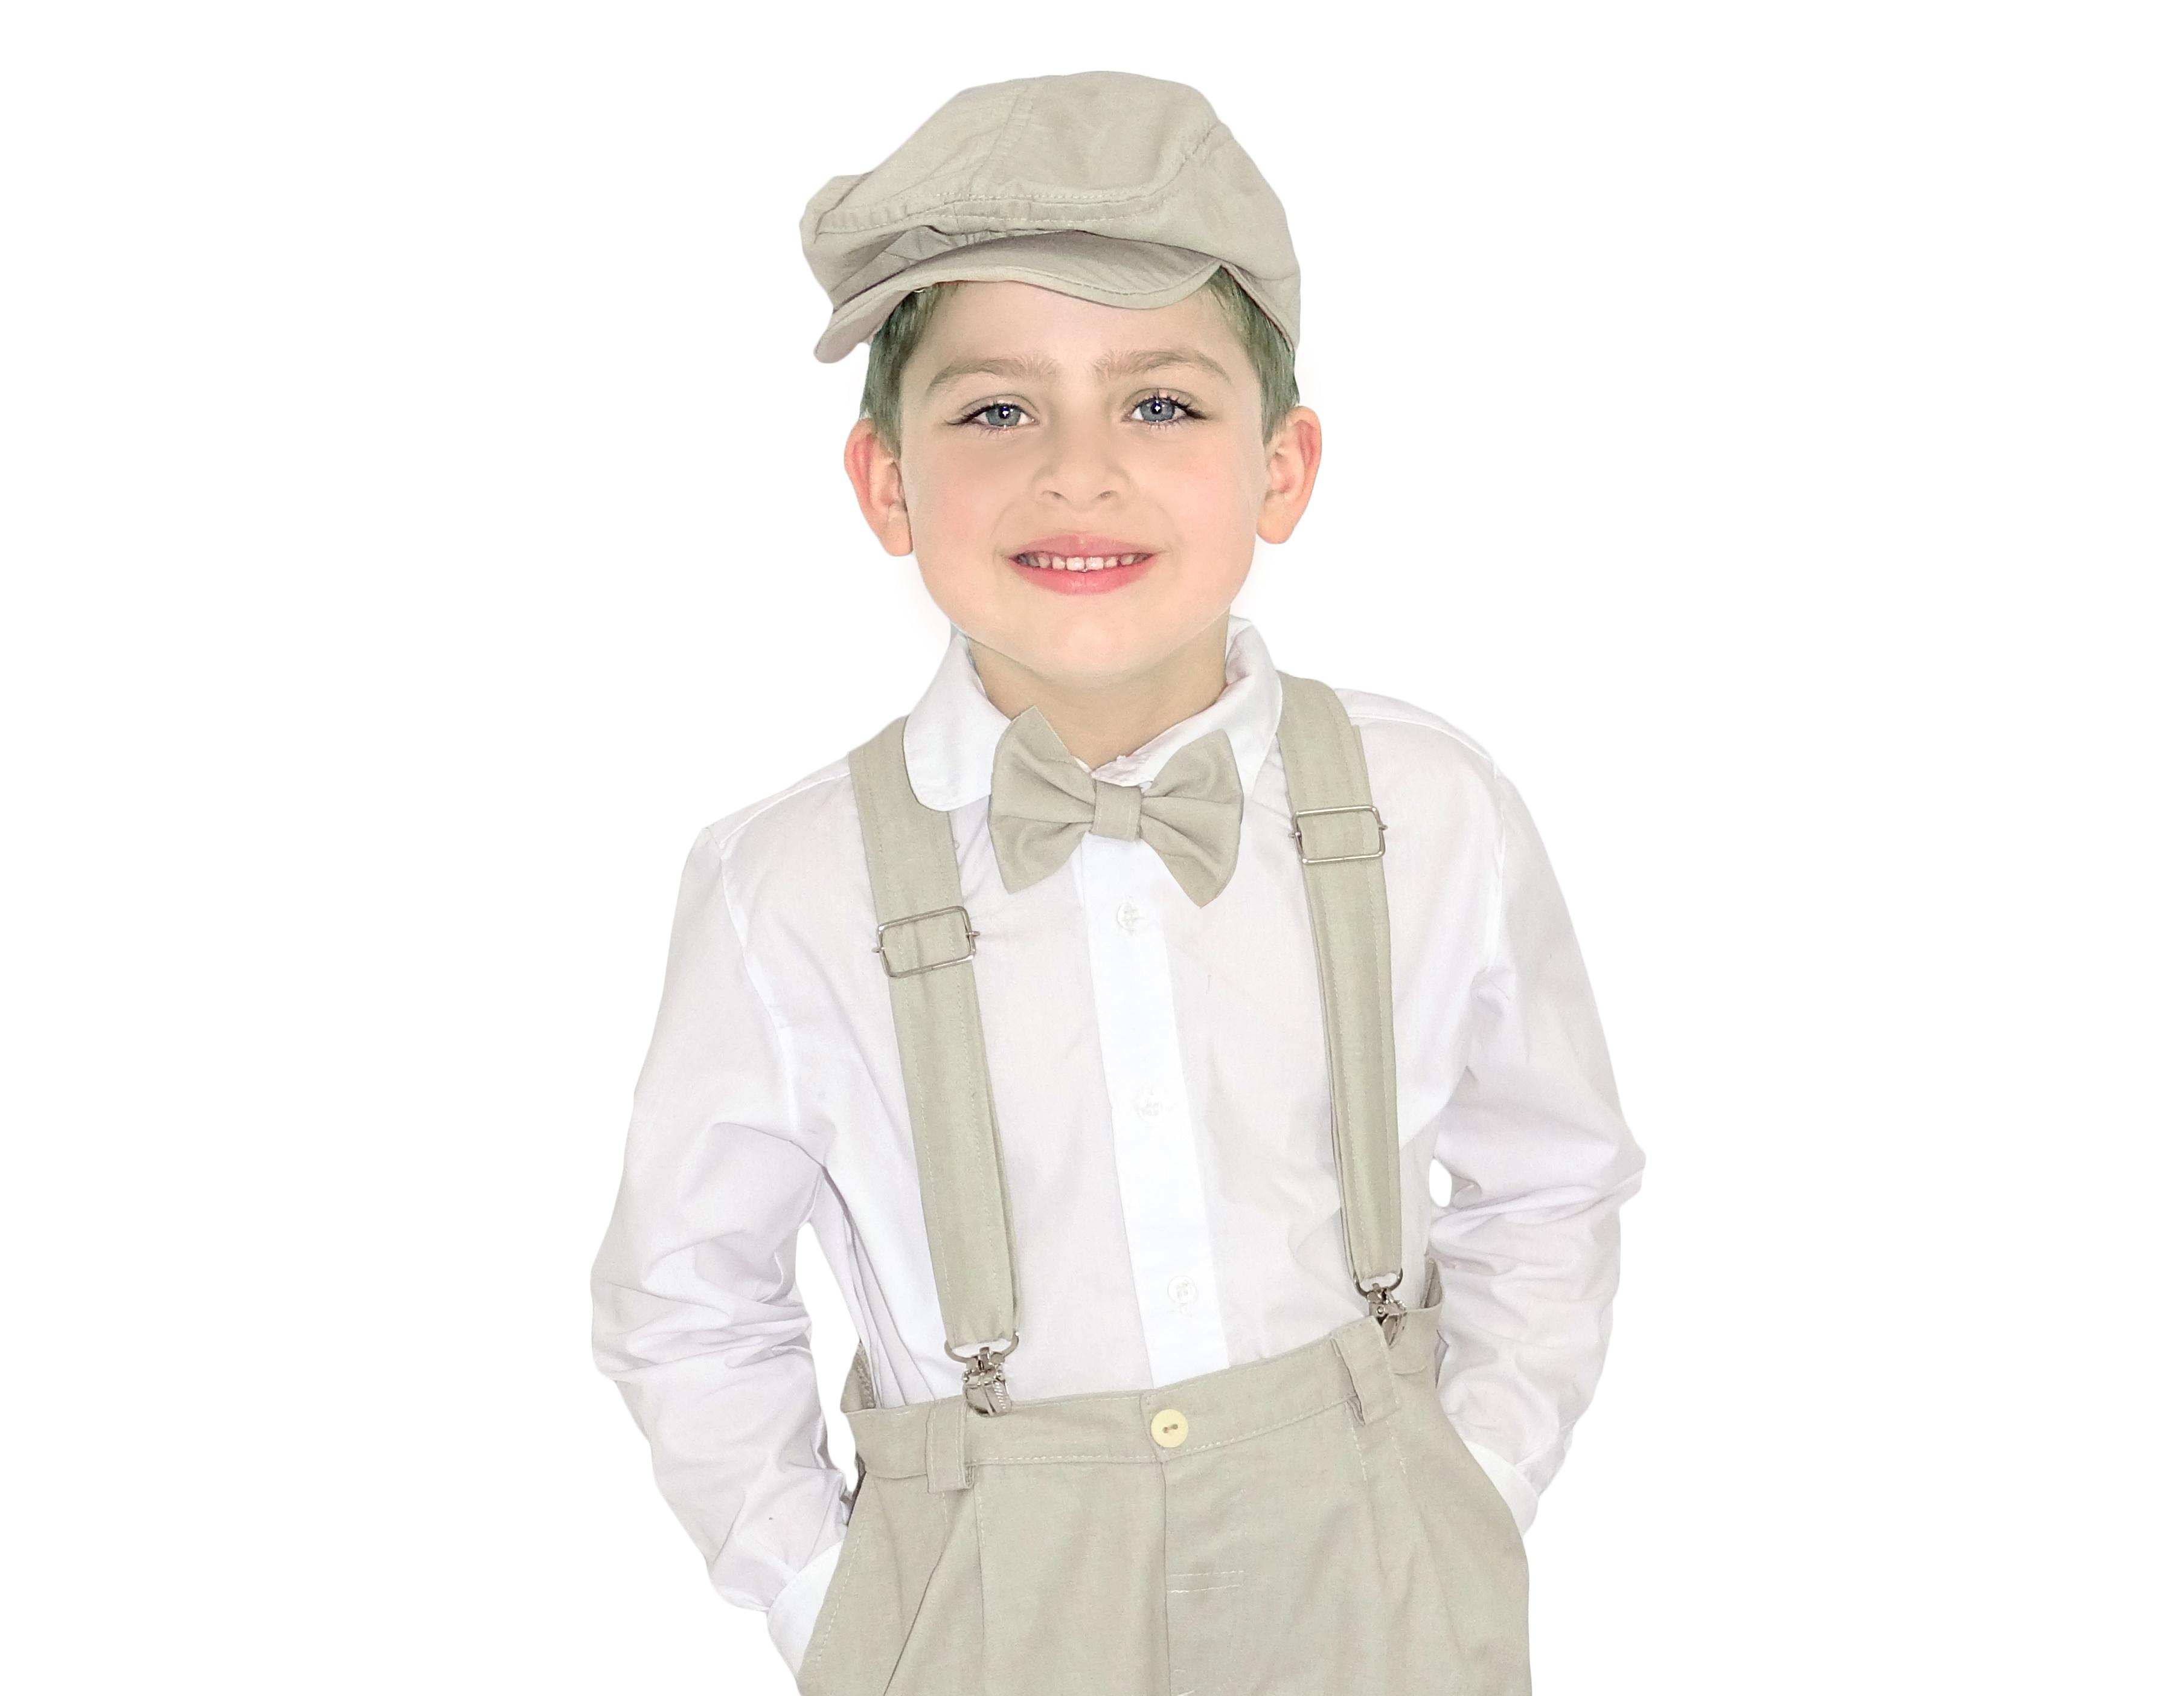 Boina Infantil Xadrez Gravata Borboleta no Elo7  2aa8dd26d0b